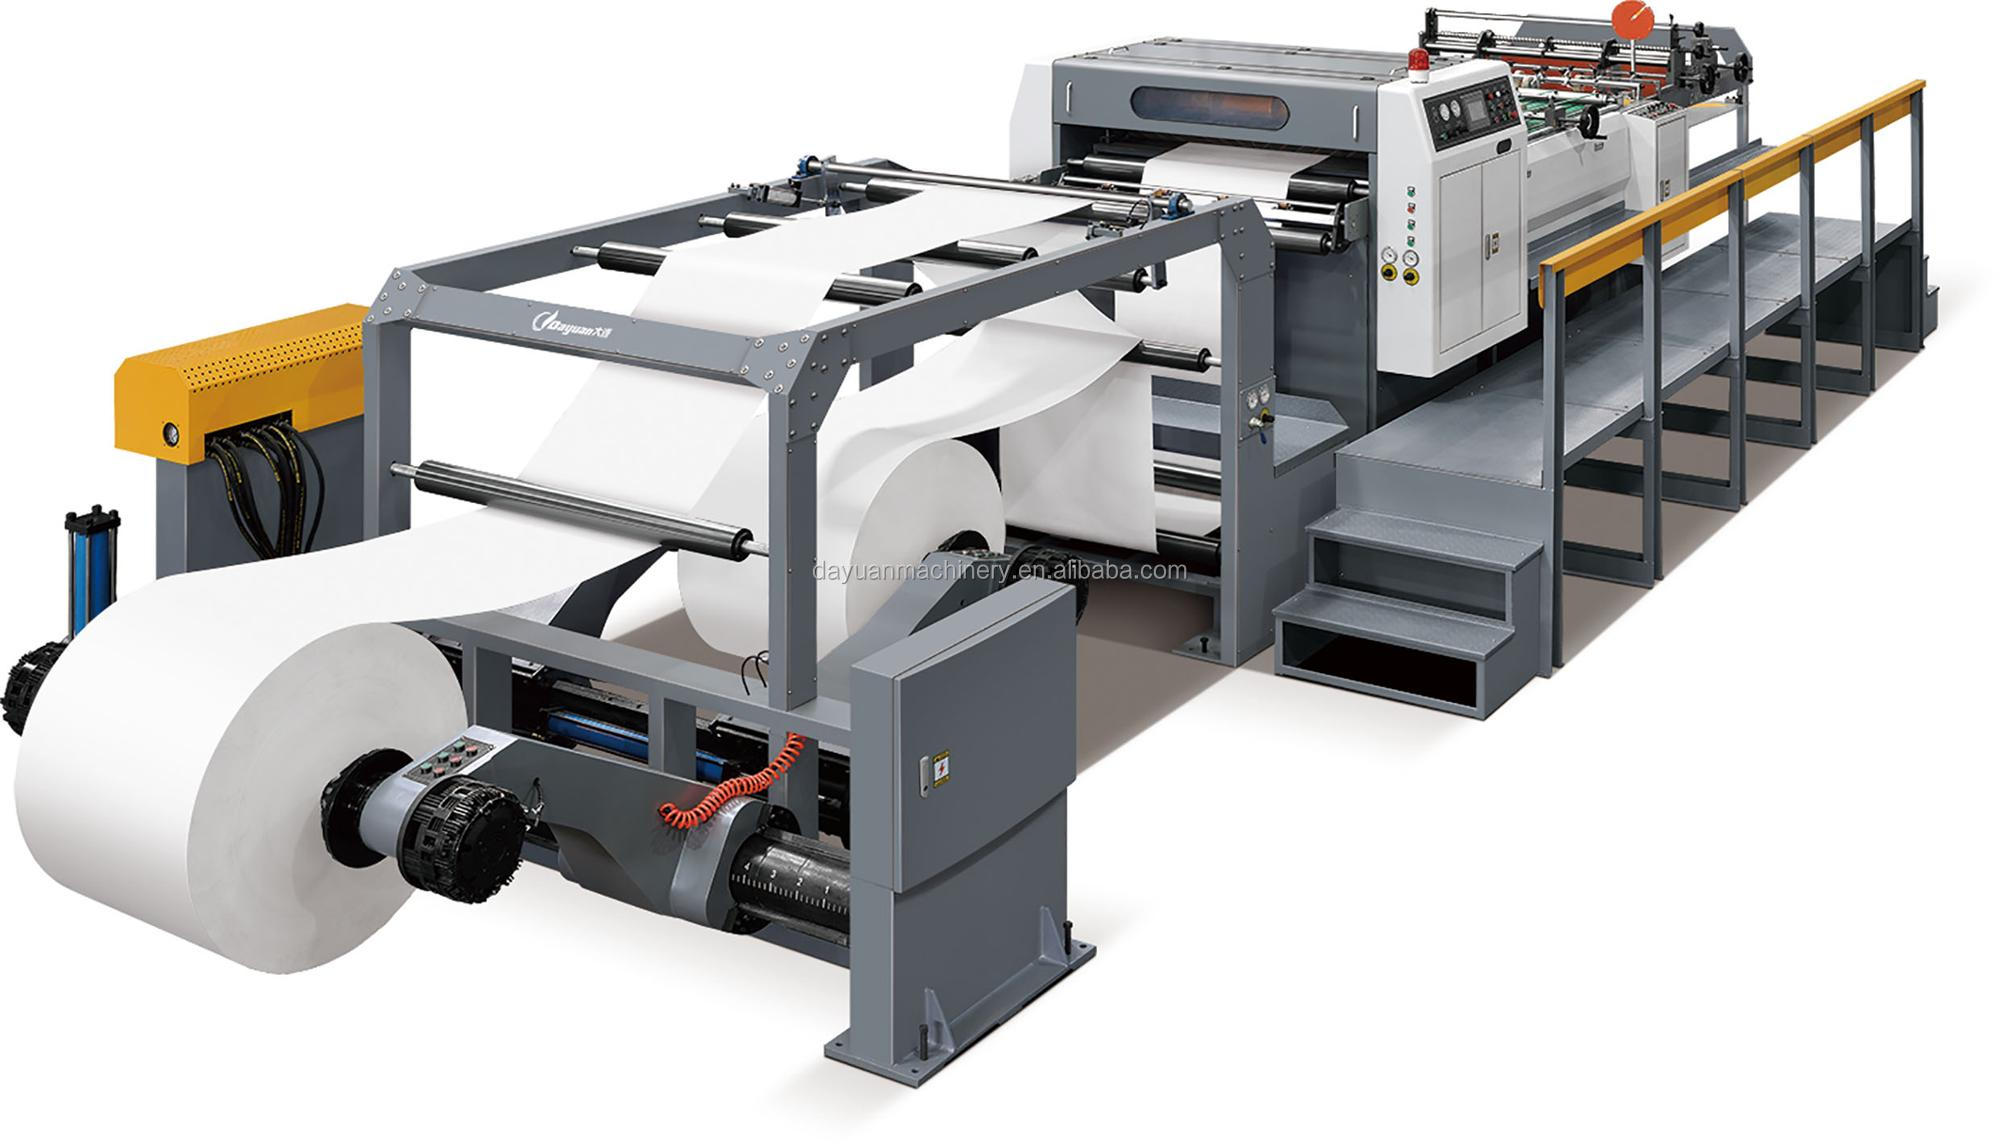 Toptan Rulo Kağıt Işleme Makinesi Kaliteli